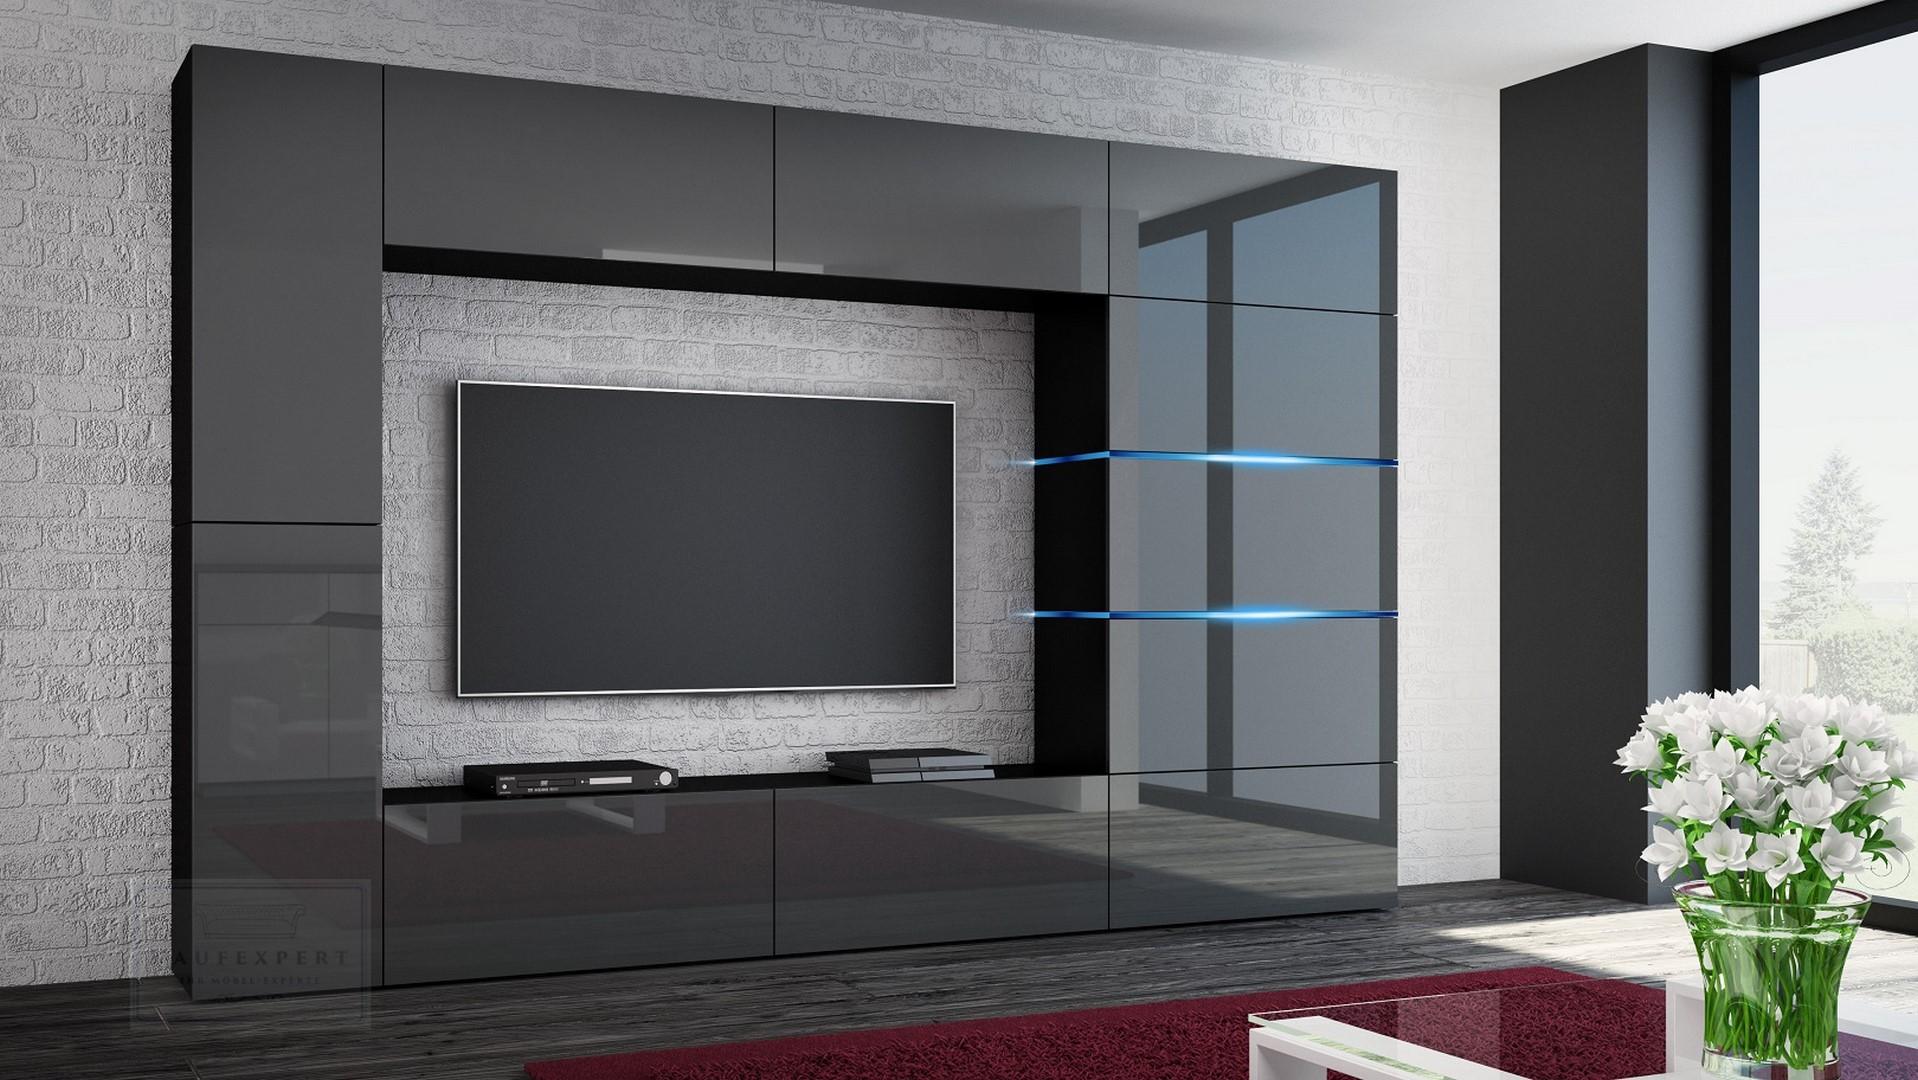 Wohnwand Shadow Grau Hochglanz/Schwarz 285 Cm Mediawand Anbauwand Medienwand Design